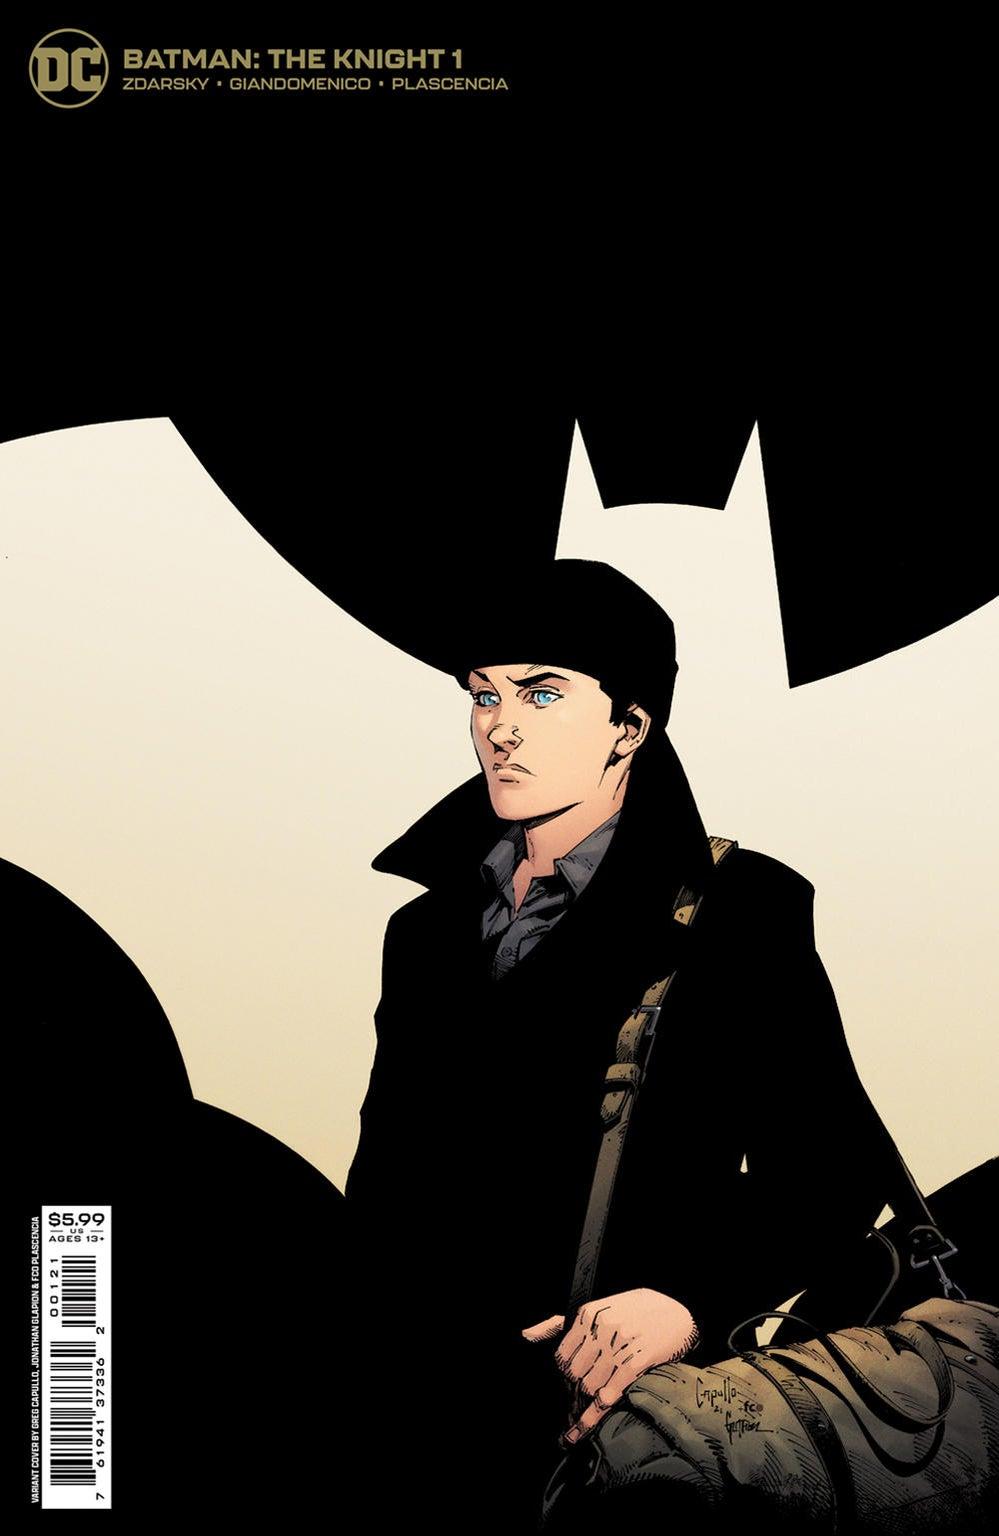 batman-the-knight-cv1-var-greg-capullo-jonathan-glapion.jpg